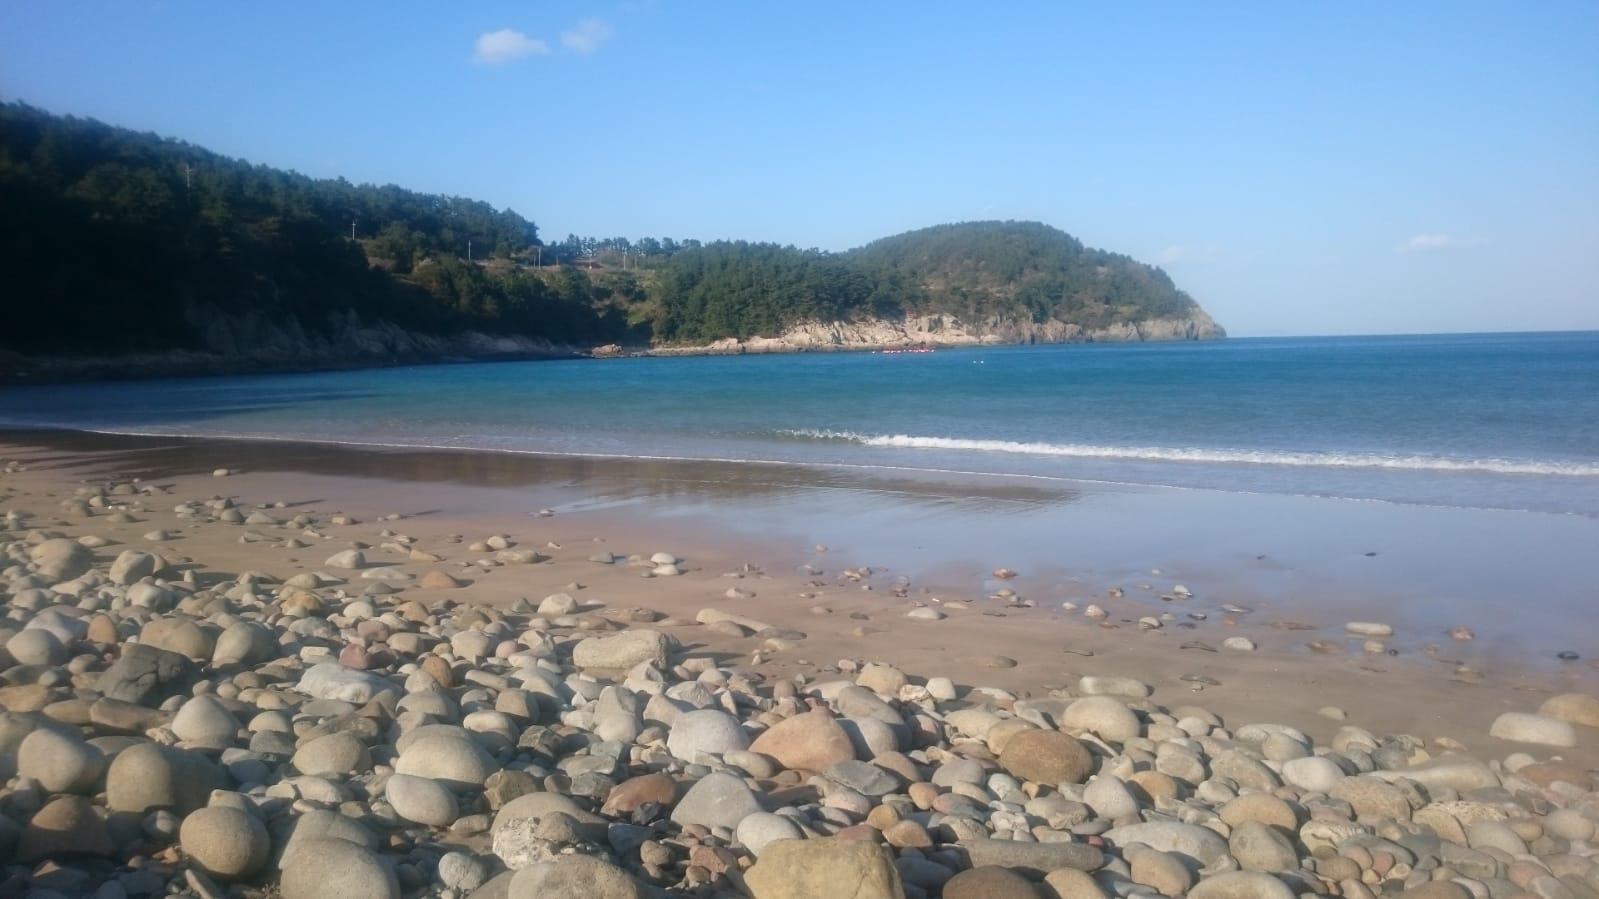 Reisetagebuch Elena und Mateo - Hallyeohaesang Nationalpark - Nam-Myeon Insel